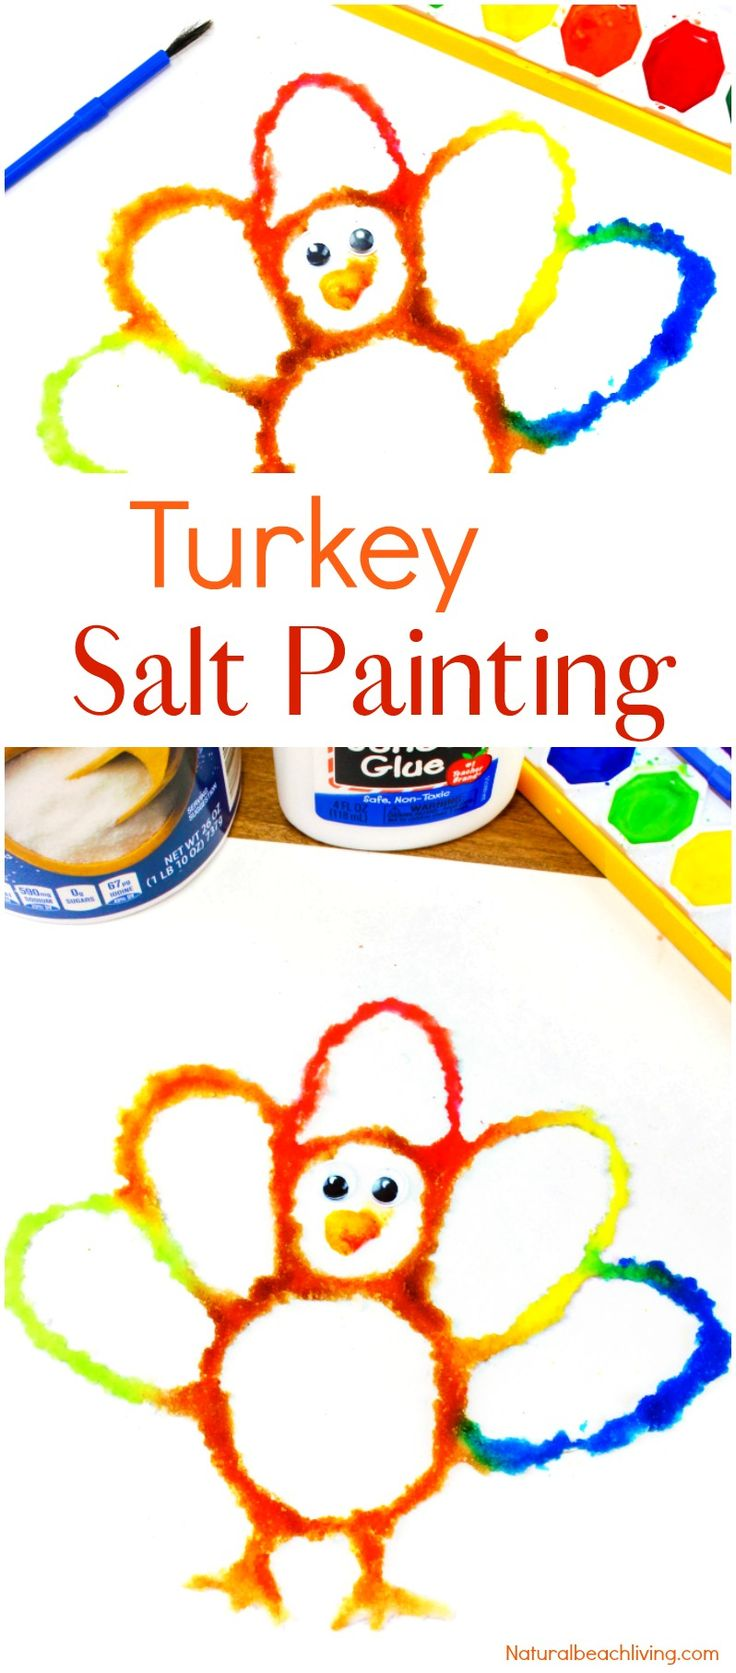 How to Make The Best Thanksgiving Turkey Salt Painting, Watercolor Salt Painting, Turkey Preschool Craft, Fun Fall Turkey craft kids love, Raised salt painting, process art